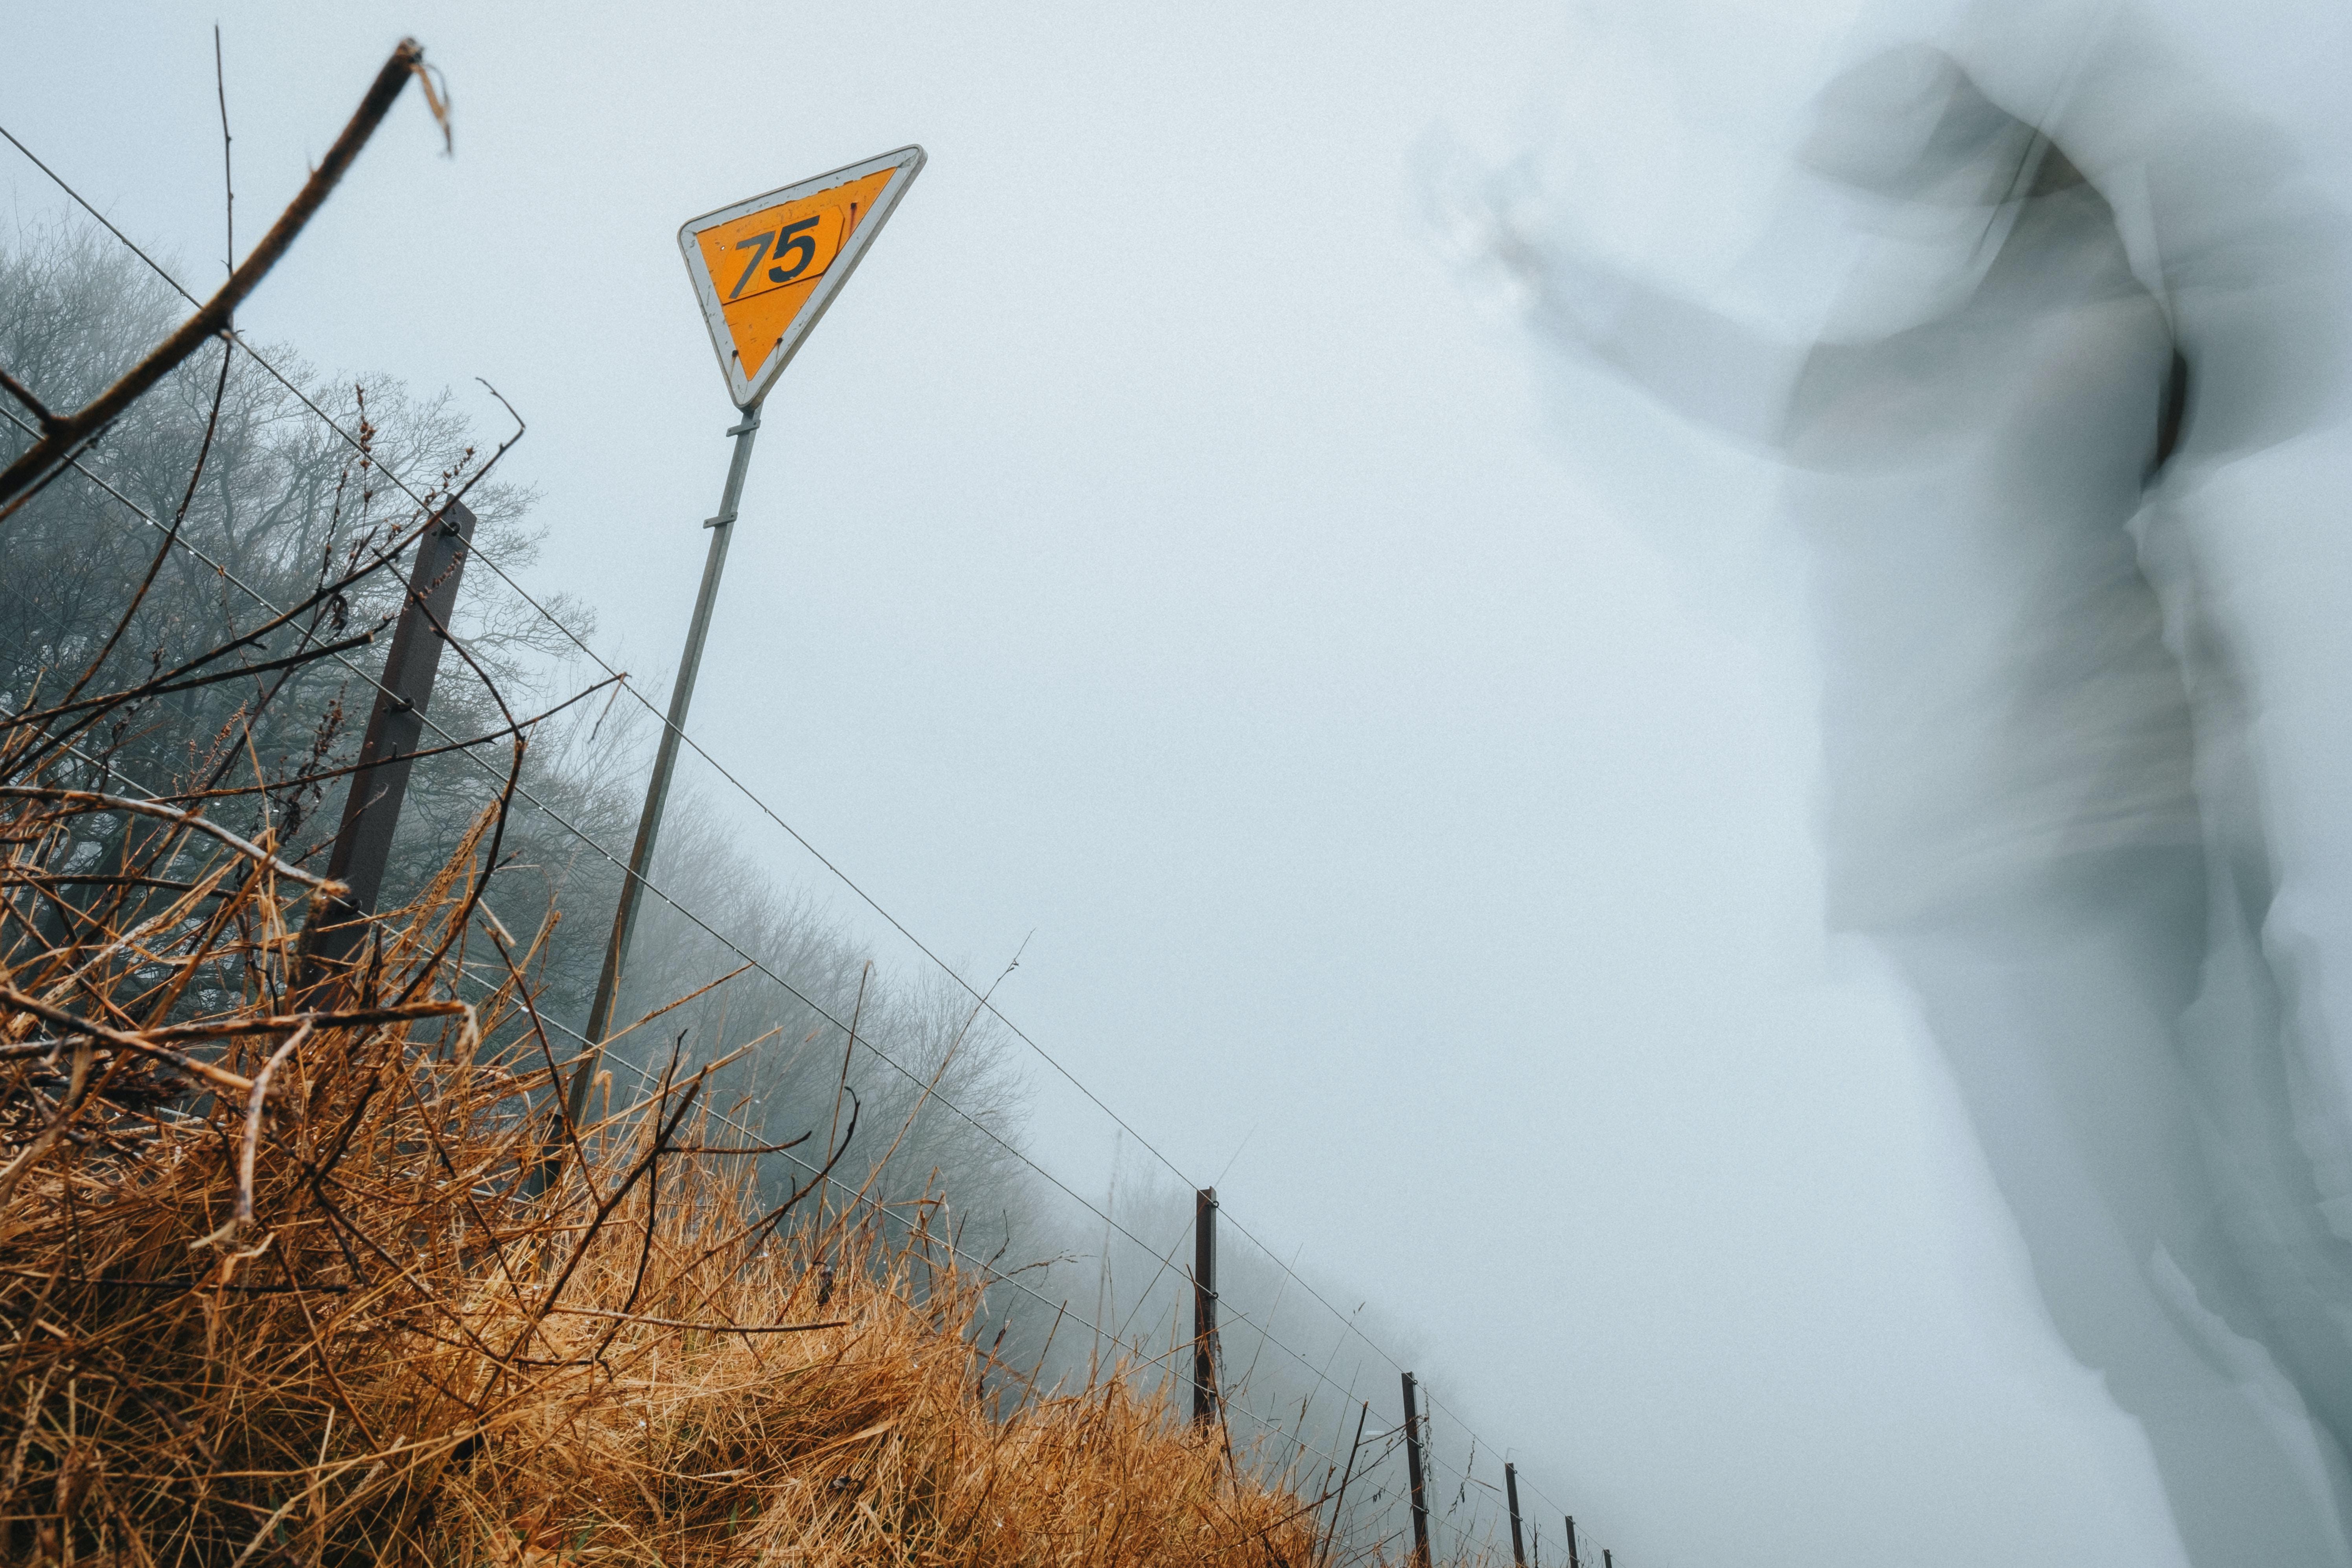 Ghostly figure warning